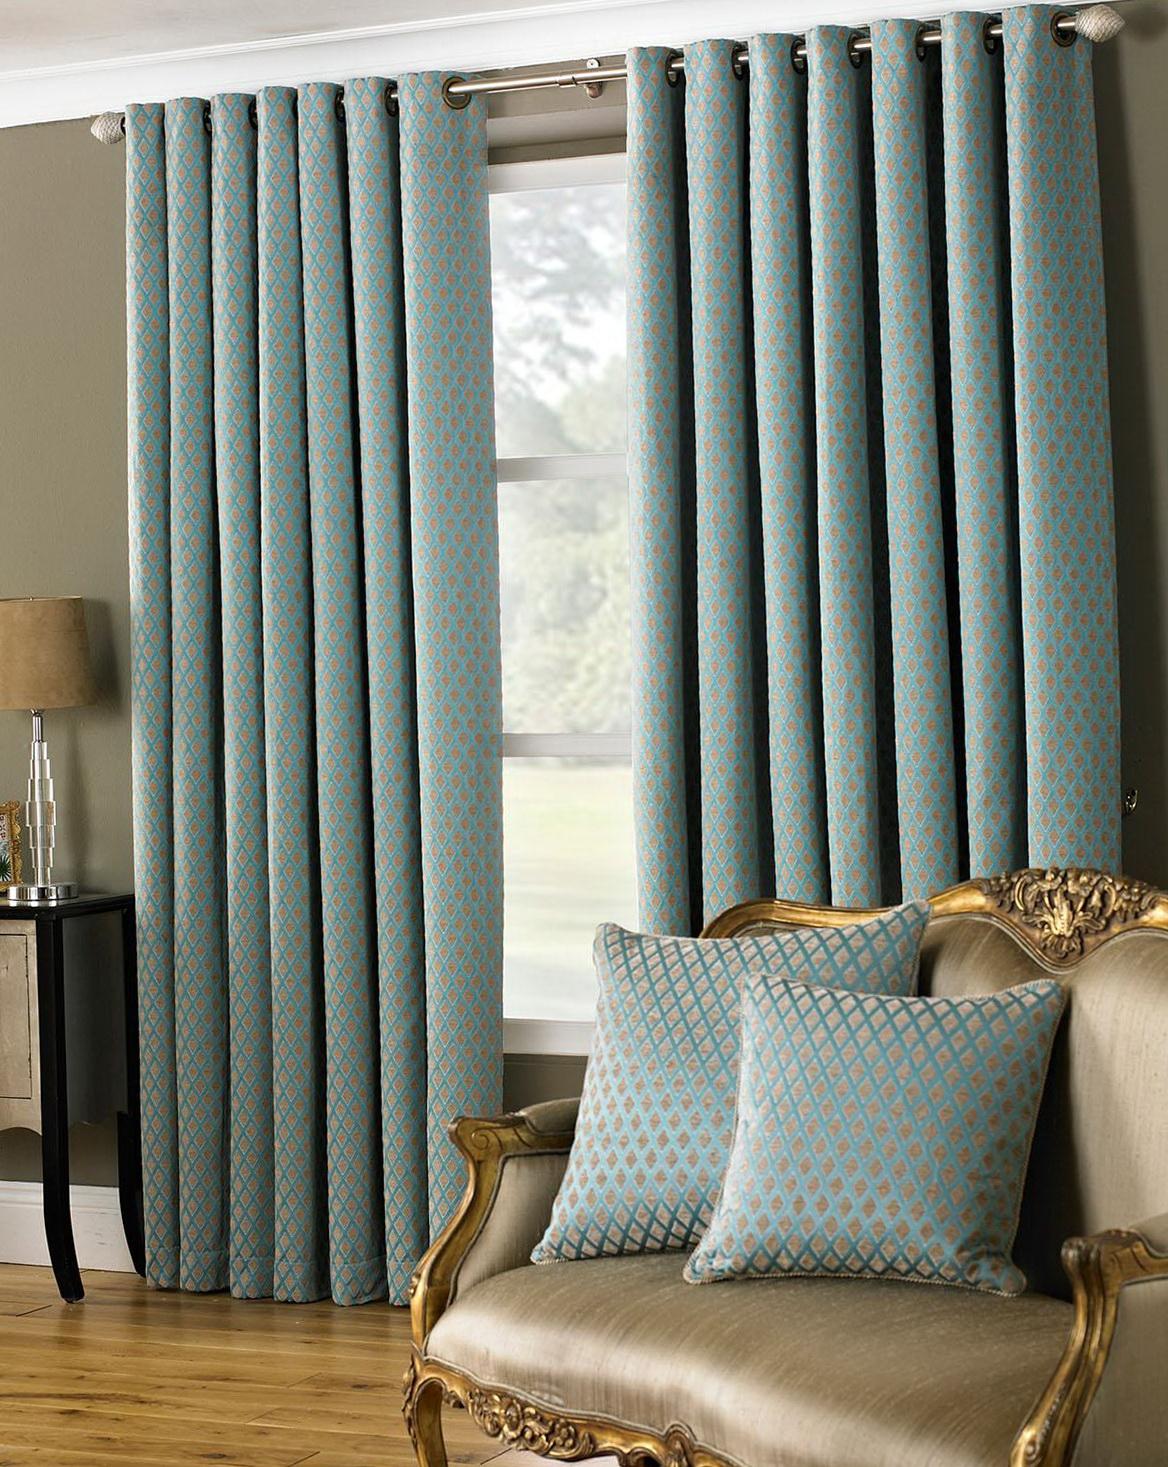 ready made curtains uk home design ideas. Black Bedroom Furniture Sets. Home Design Ideas